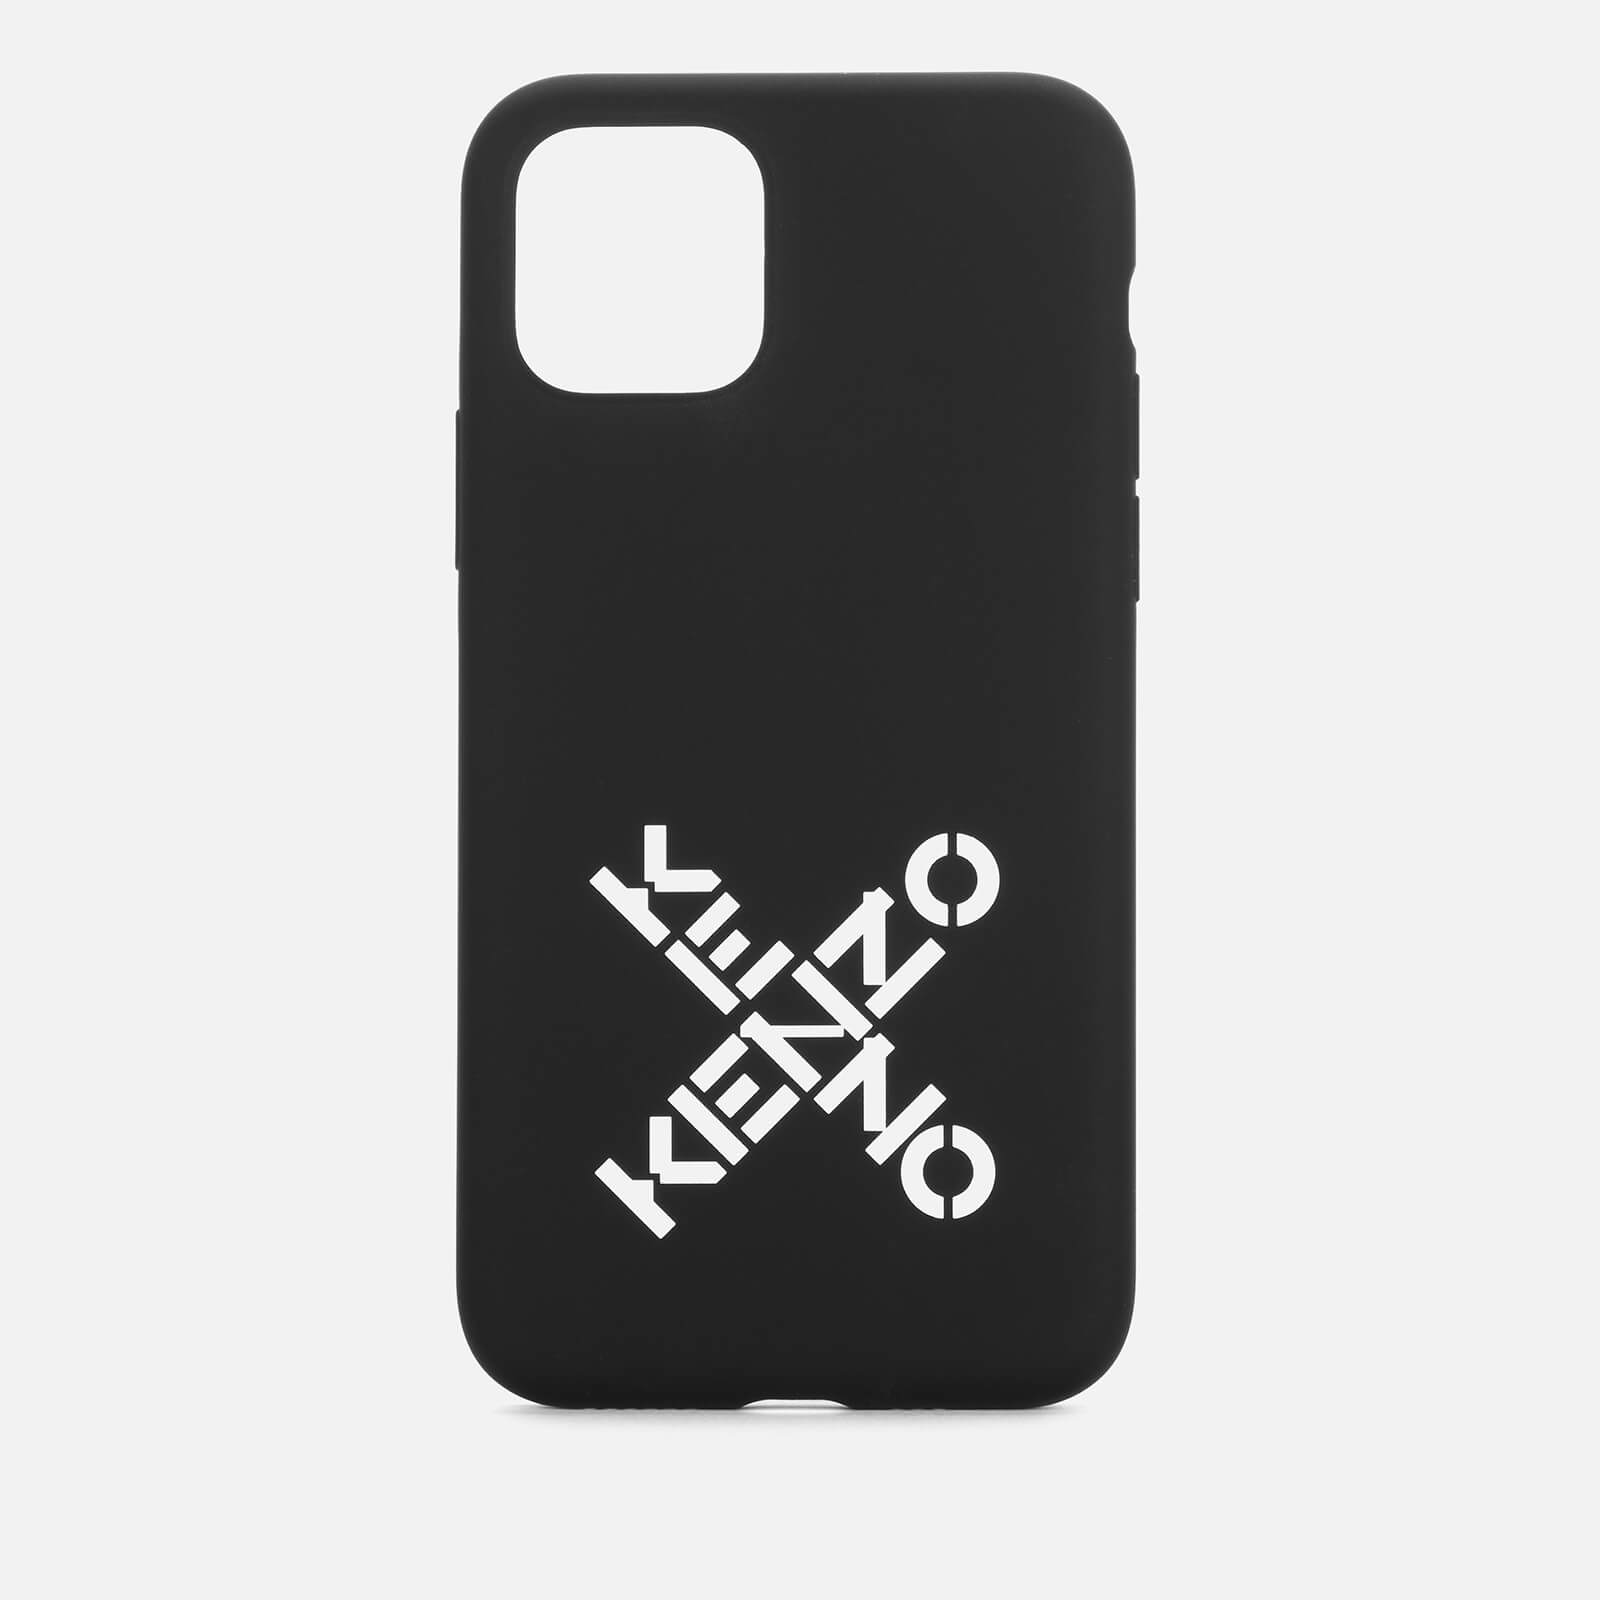 KENZO Men's Sport iPhone 11 Pro Phone Case - Black